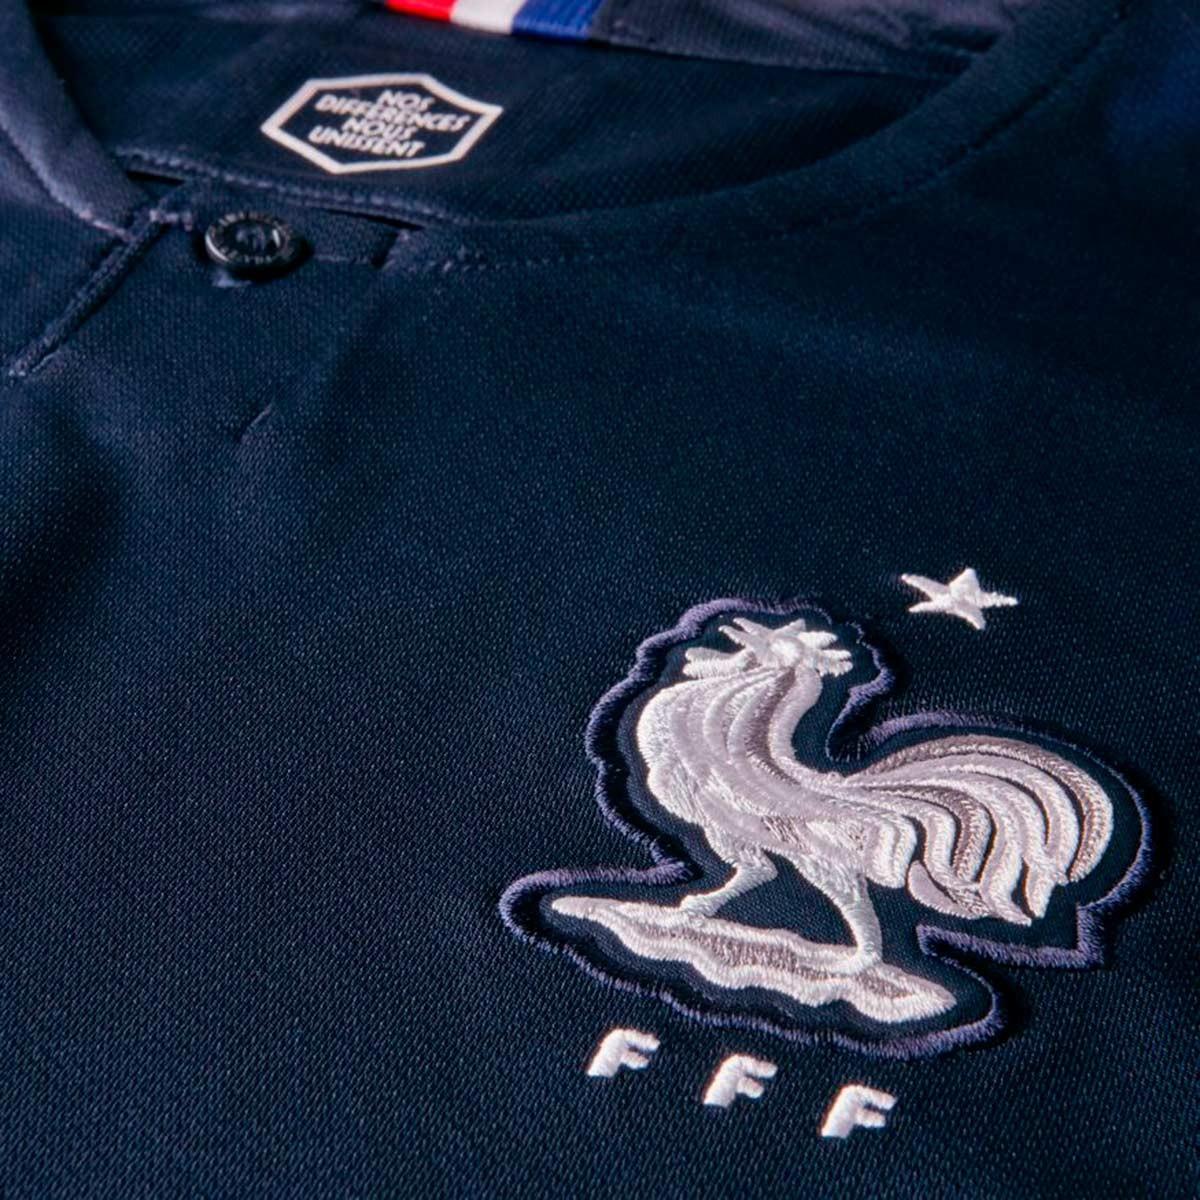 Camisola Nike França Breathe Stadium Equipamento Principal 2018-2019 Mulher  Obsidian-White - Loja de futebol Fútbol Emotion d424470974ac1